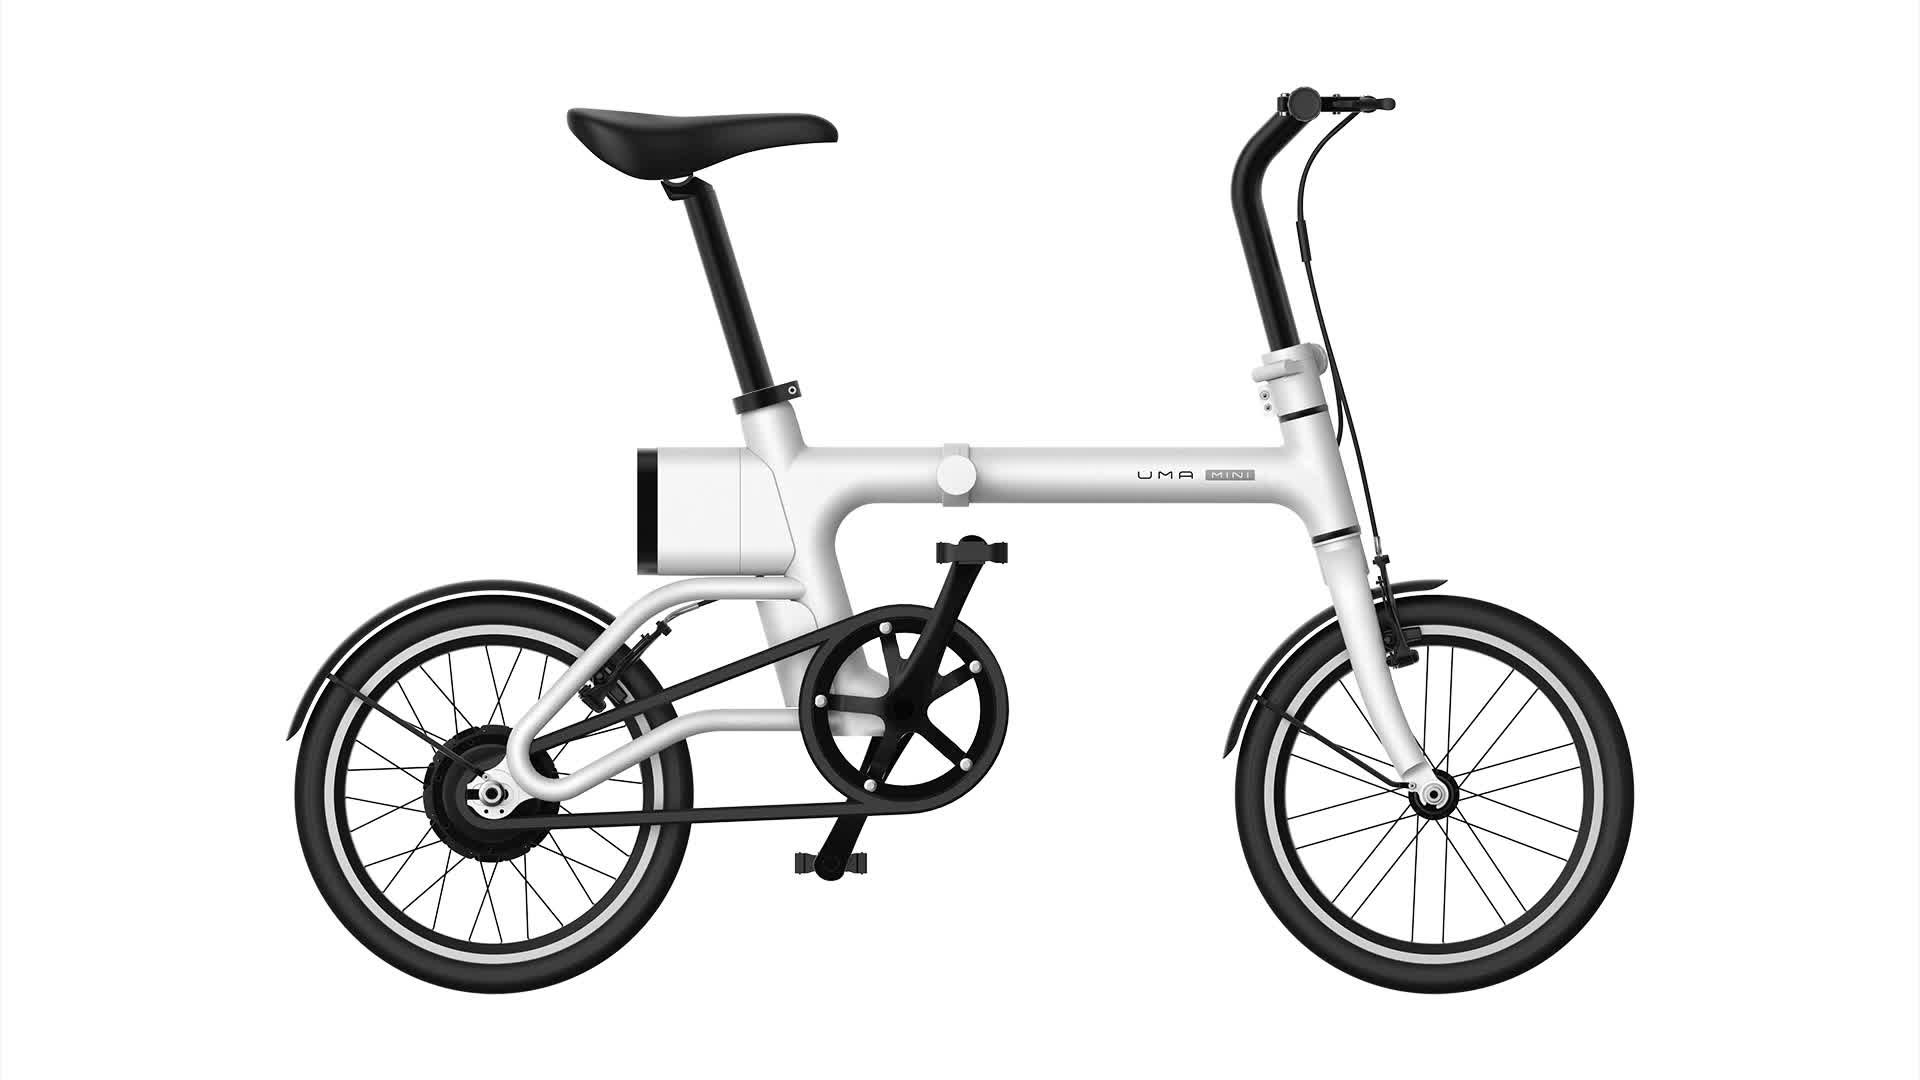 16 Inch Tire 36v Large Power Folding Bicycle Electric Pocket Bike